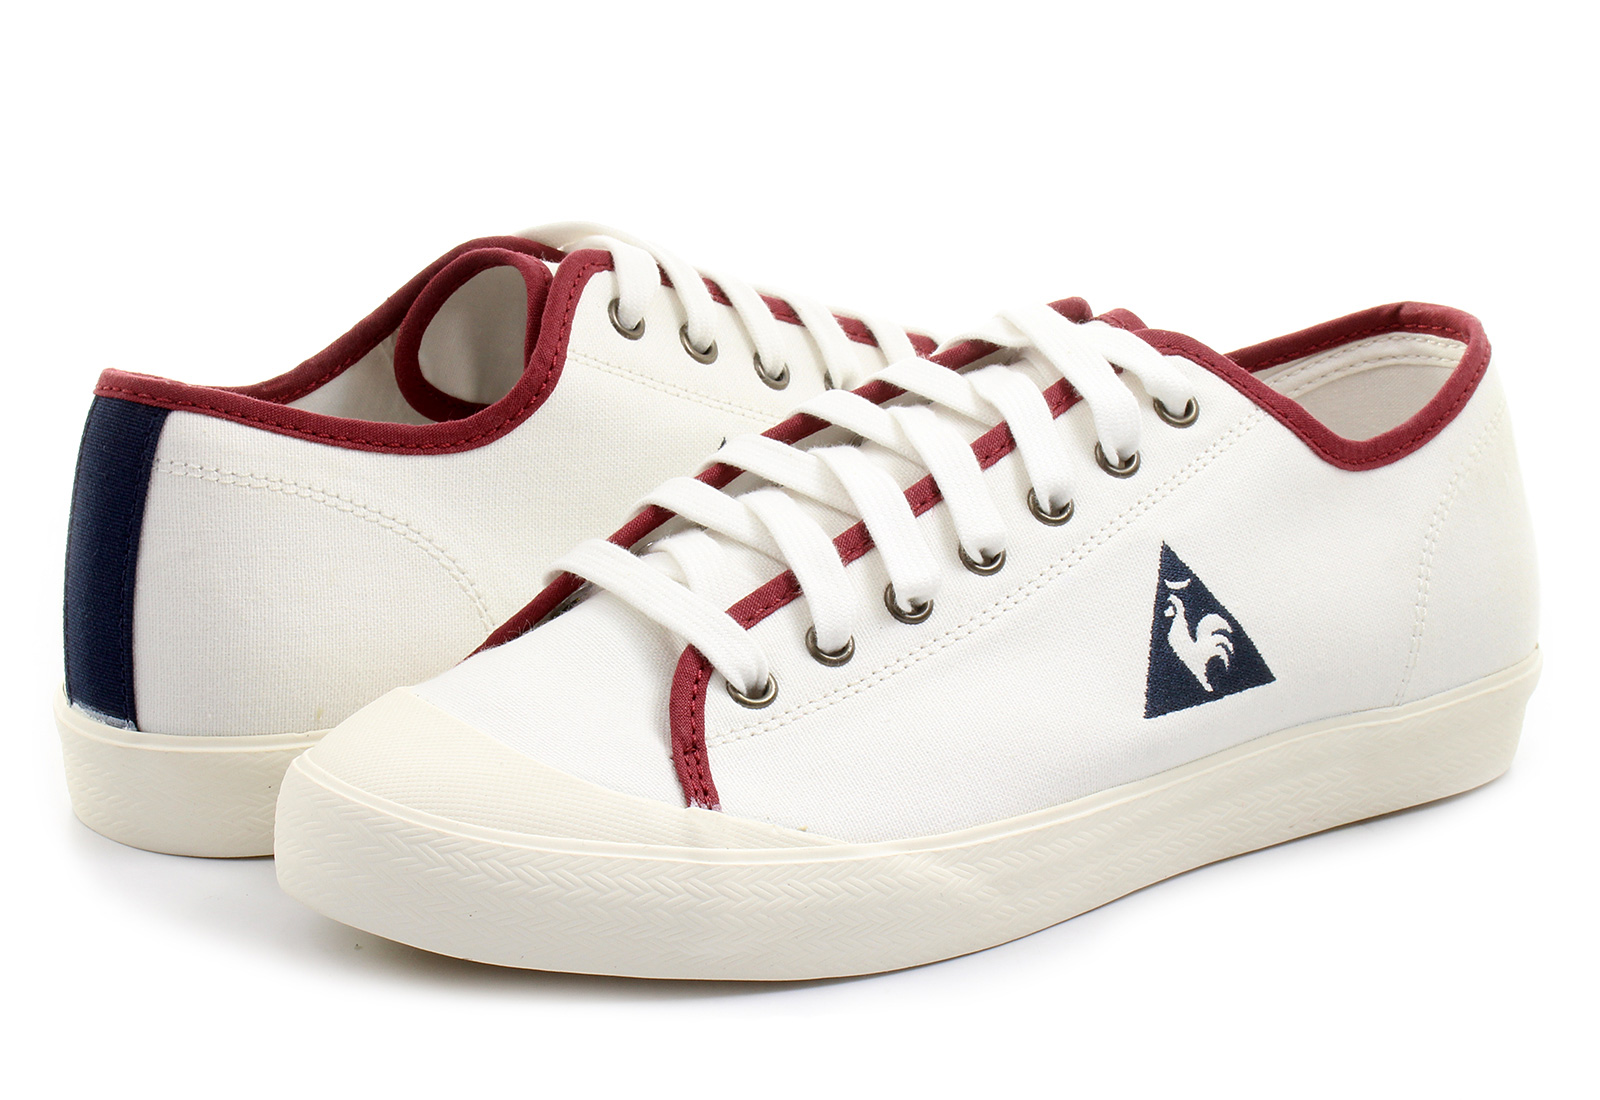 Le Coq Sportif Cipő - Estoril - 1511282 - Office Shoes Magyarország a139404f2b